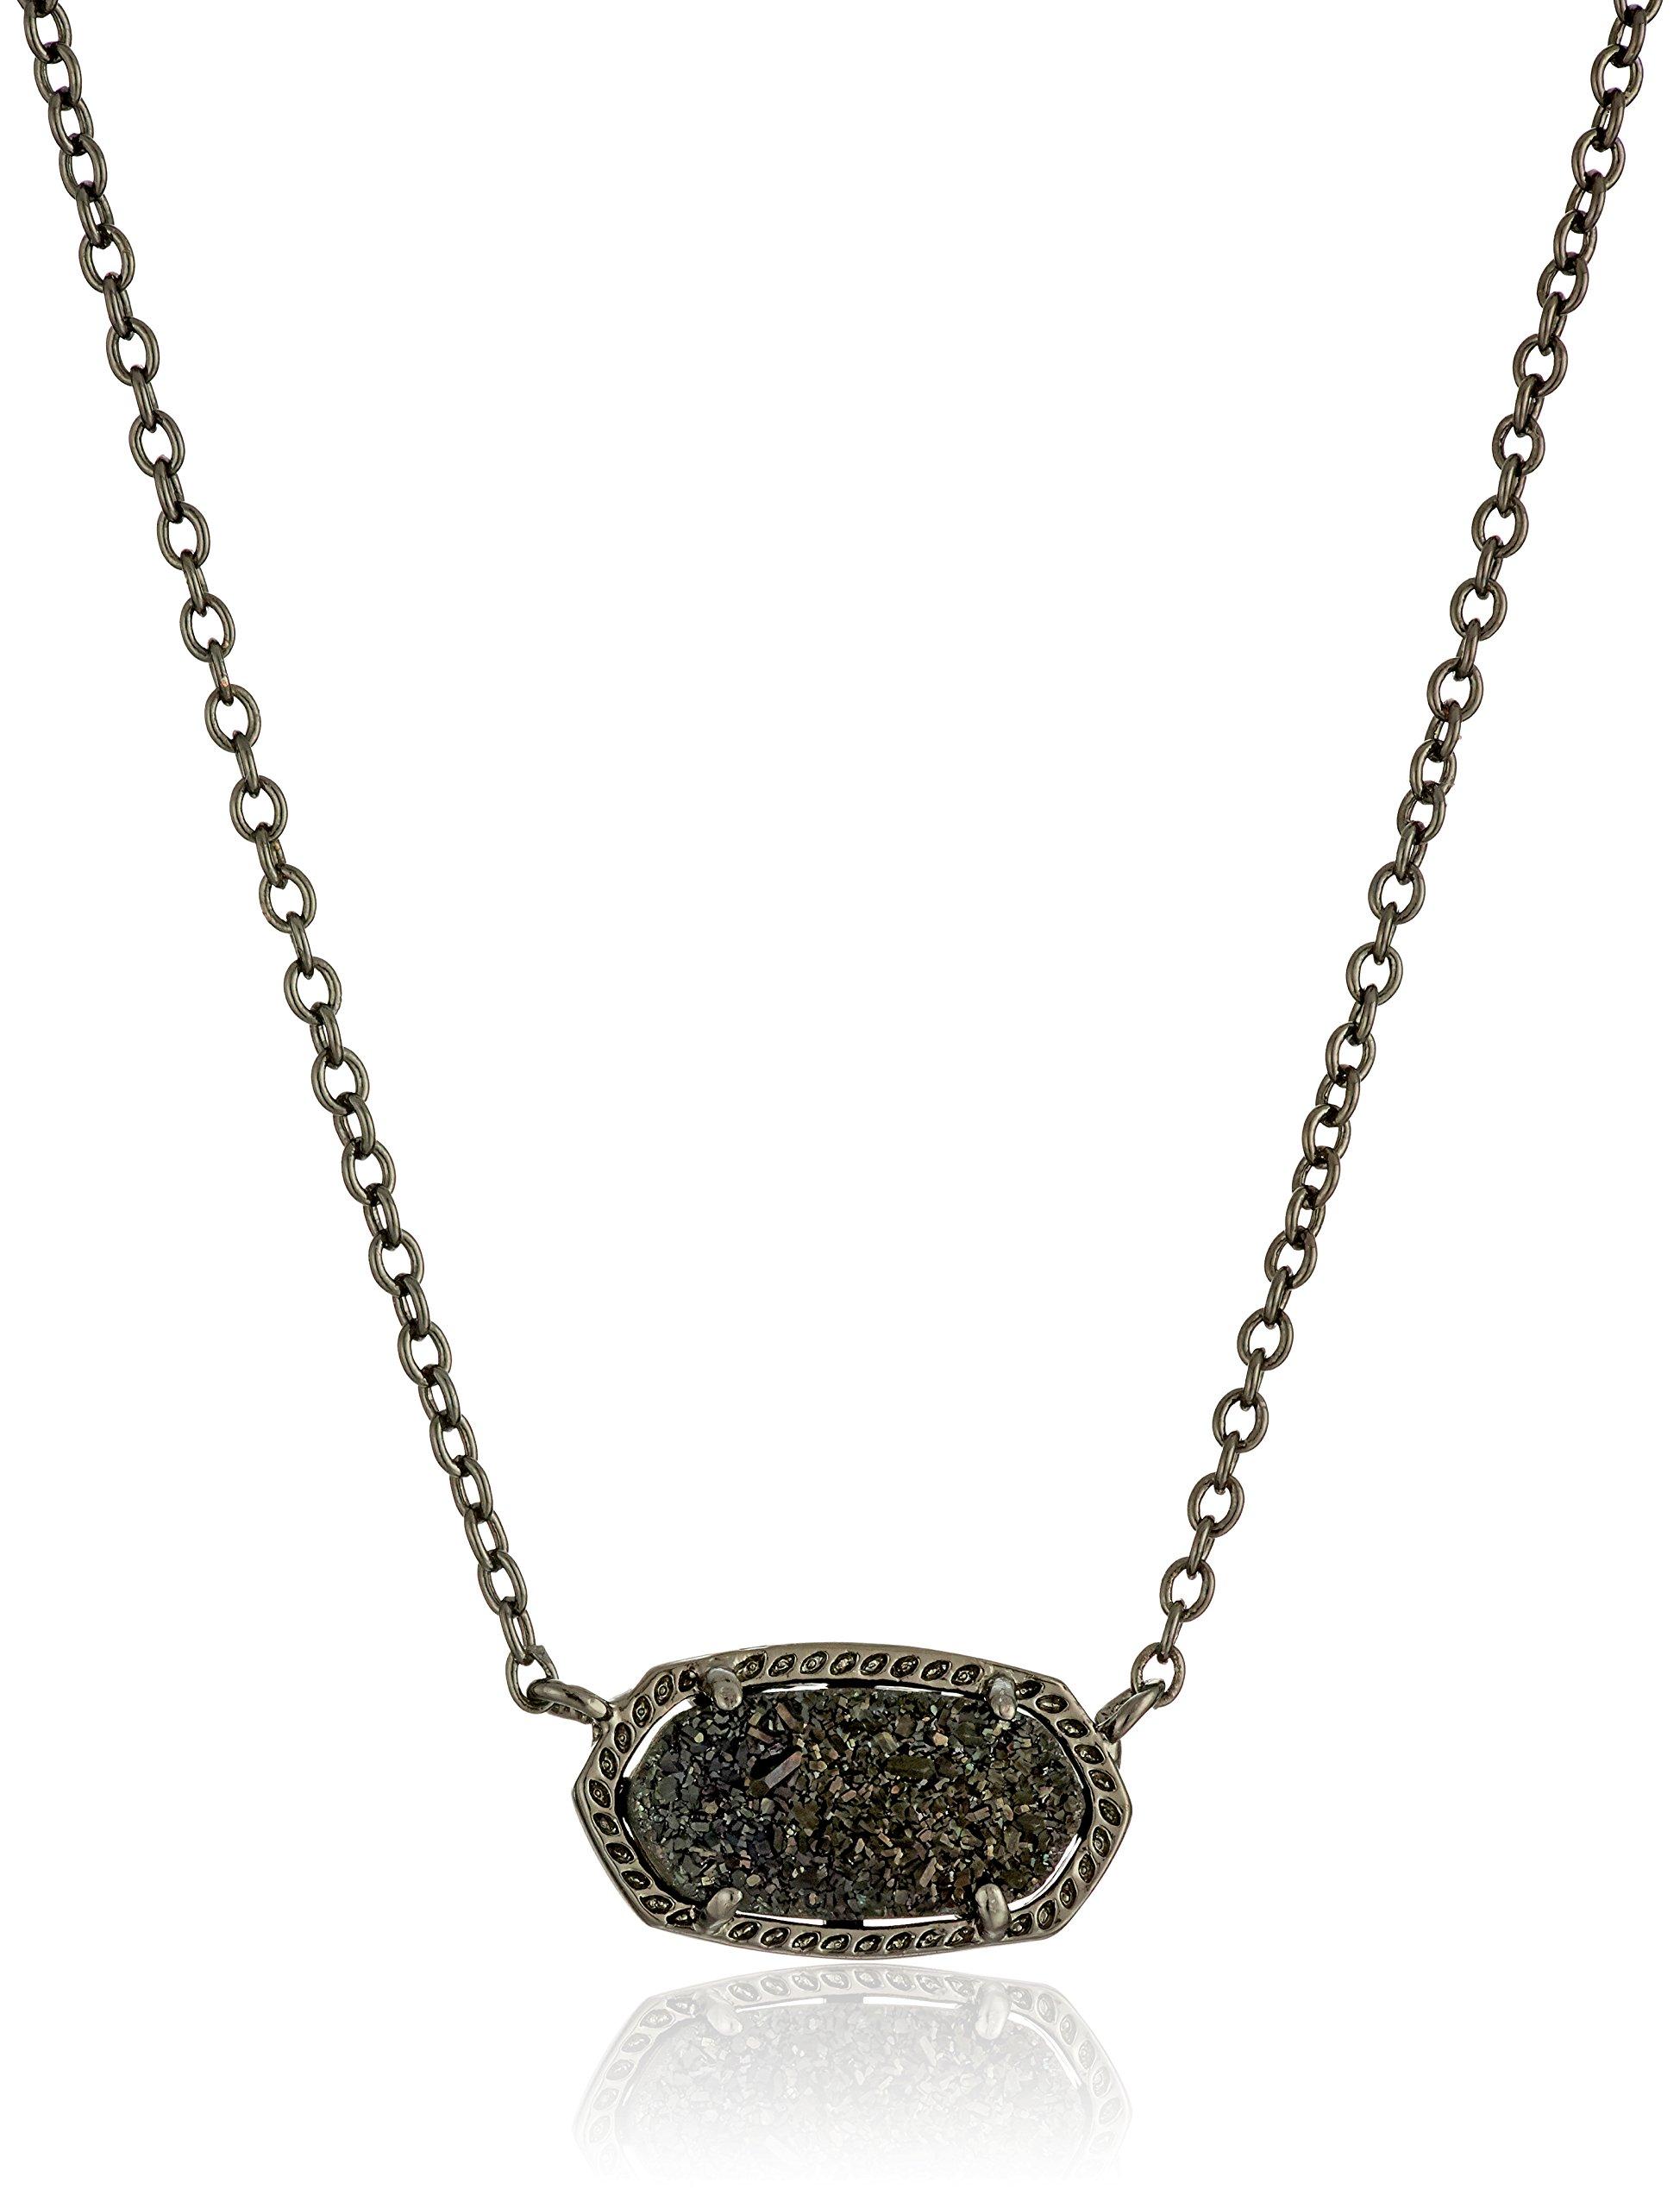 Kendra Scott Signature Elisa Gunmetal Plated Black Drusy Pendant Necklace